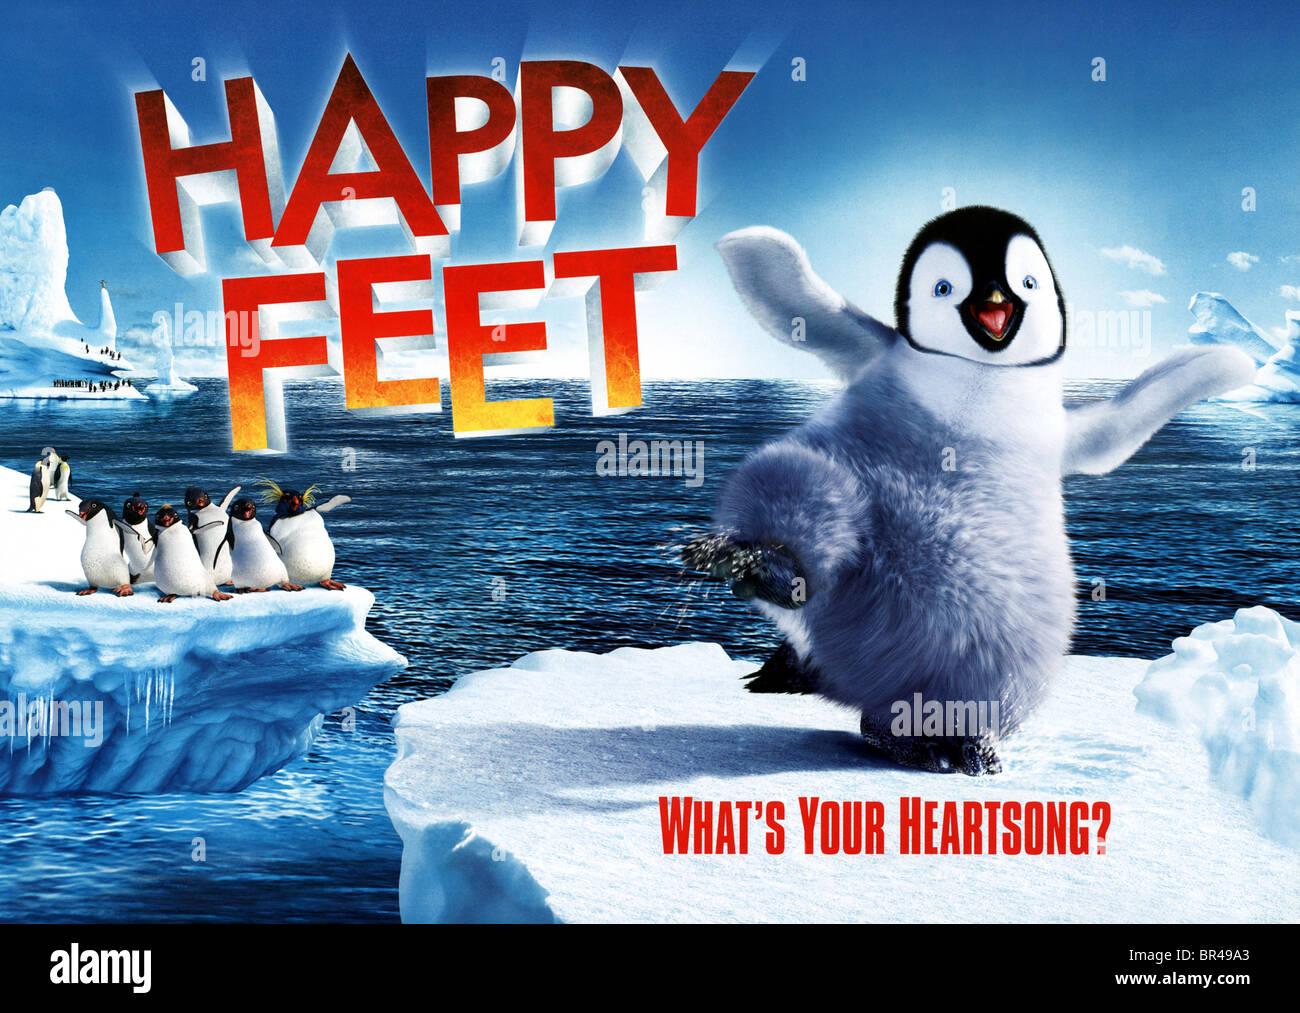 Mumble The Penguin Poster Happy Feet 2006 Stock Photo Alamy